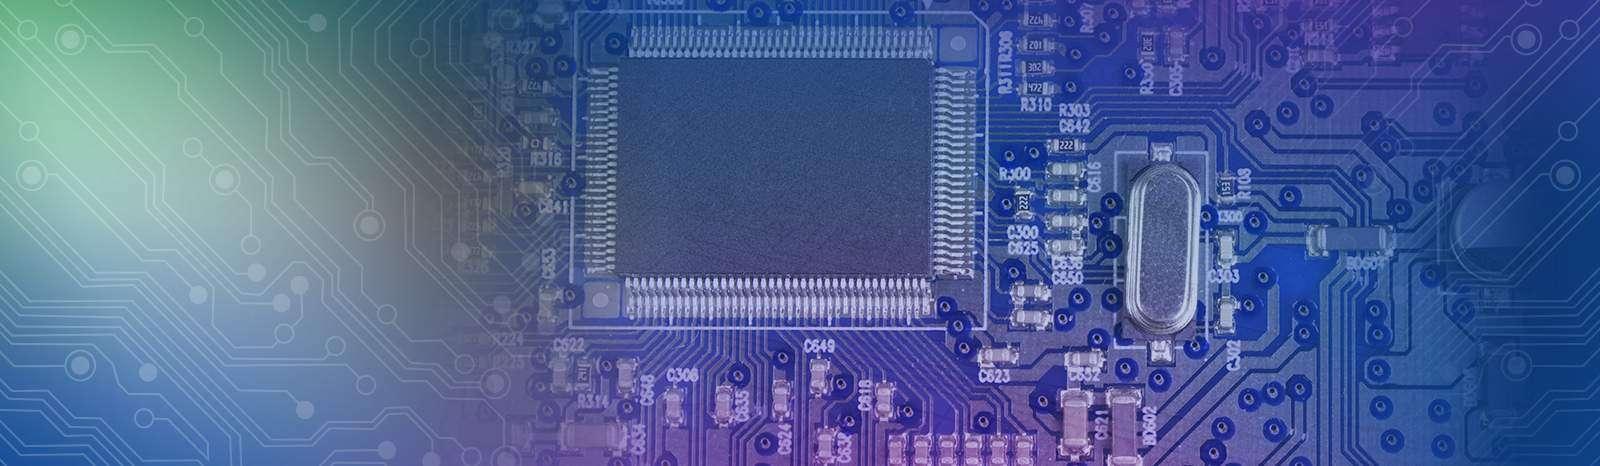 Embedded Filesystem Translation Layer Encryption